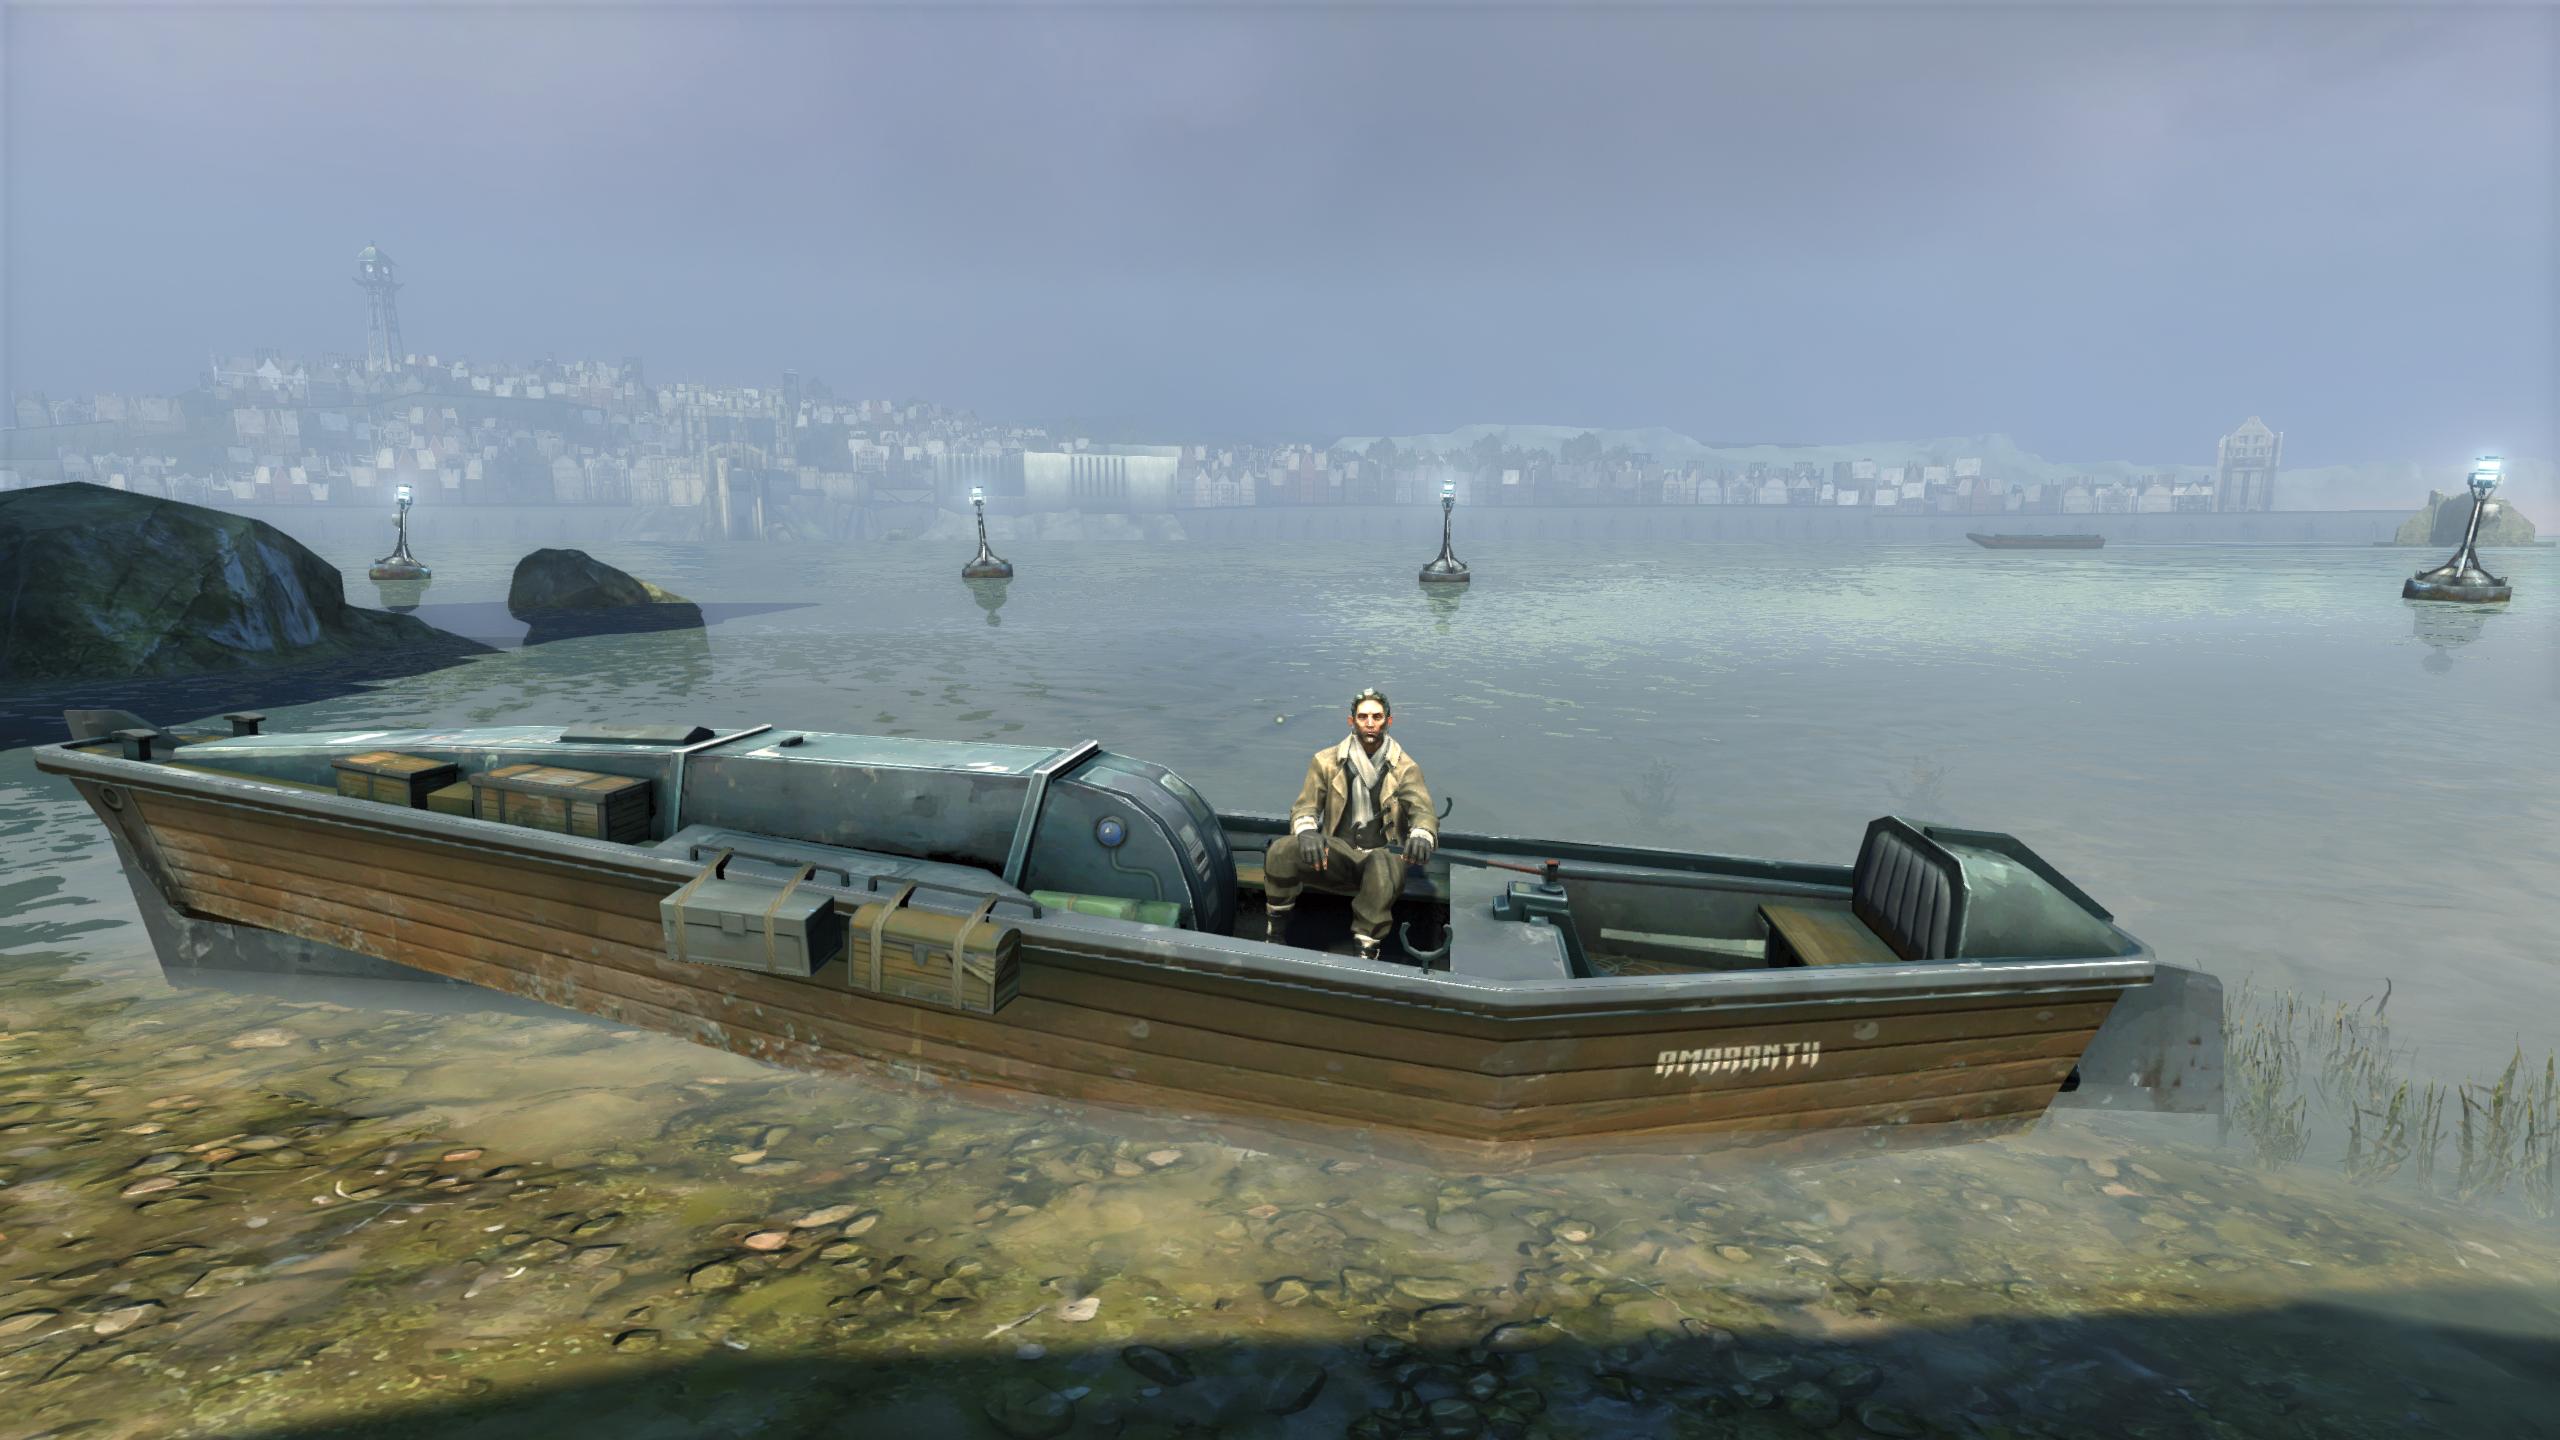 Samuel the boatman is ready for one last trip.